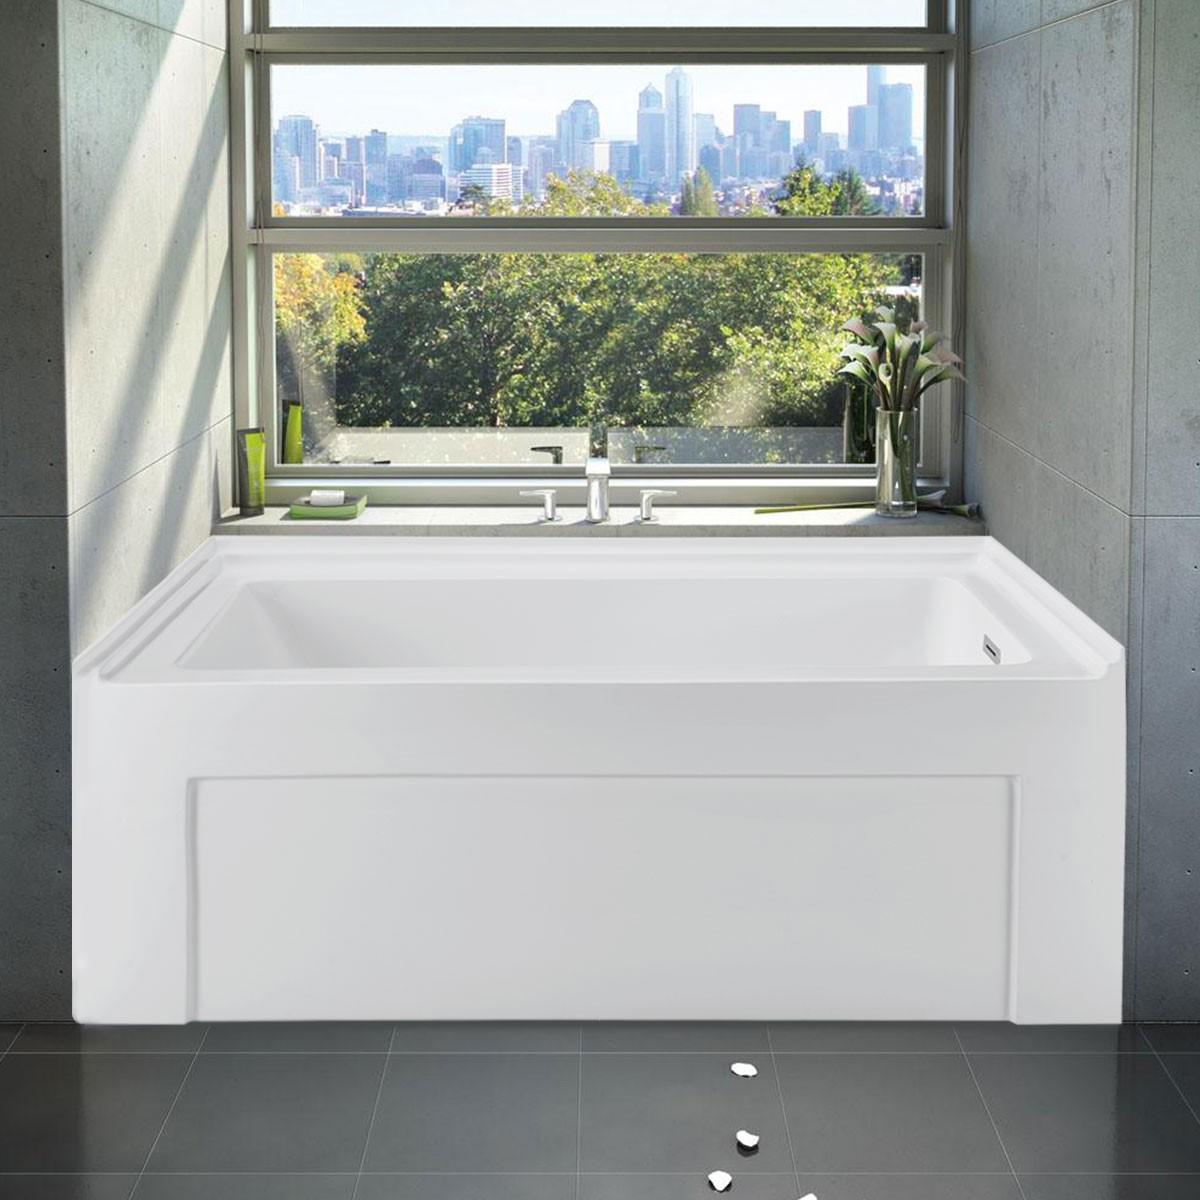 60 In Alcove Bathtub - Acrylic Pure White (DK-PW-BT990003R ...